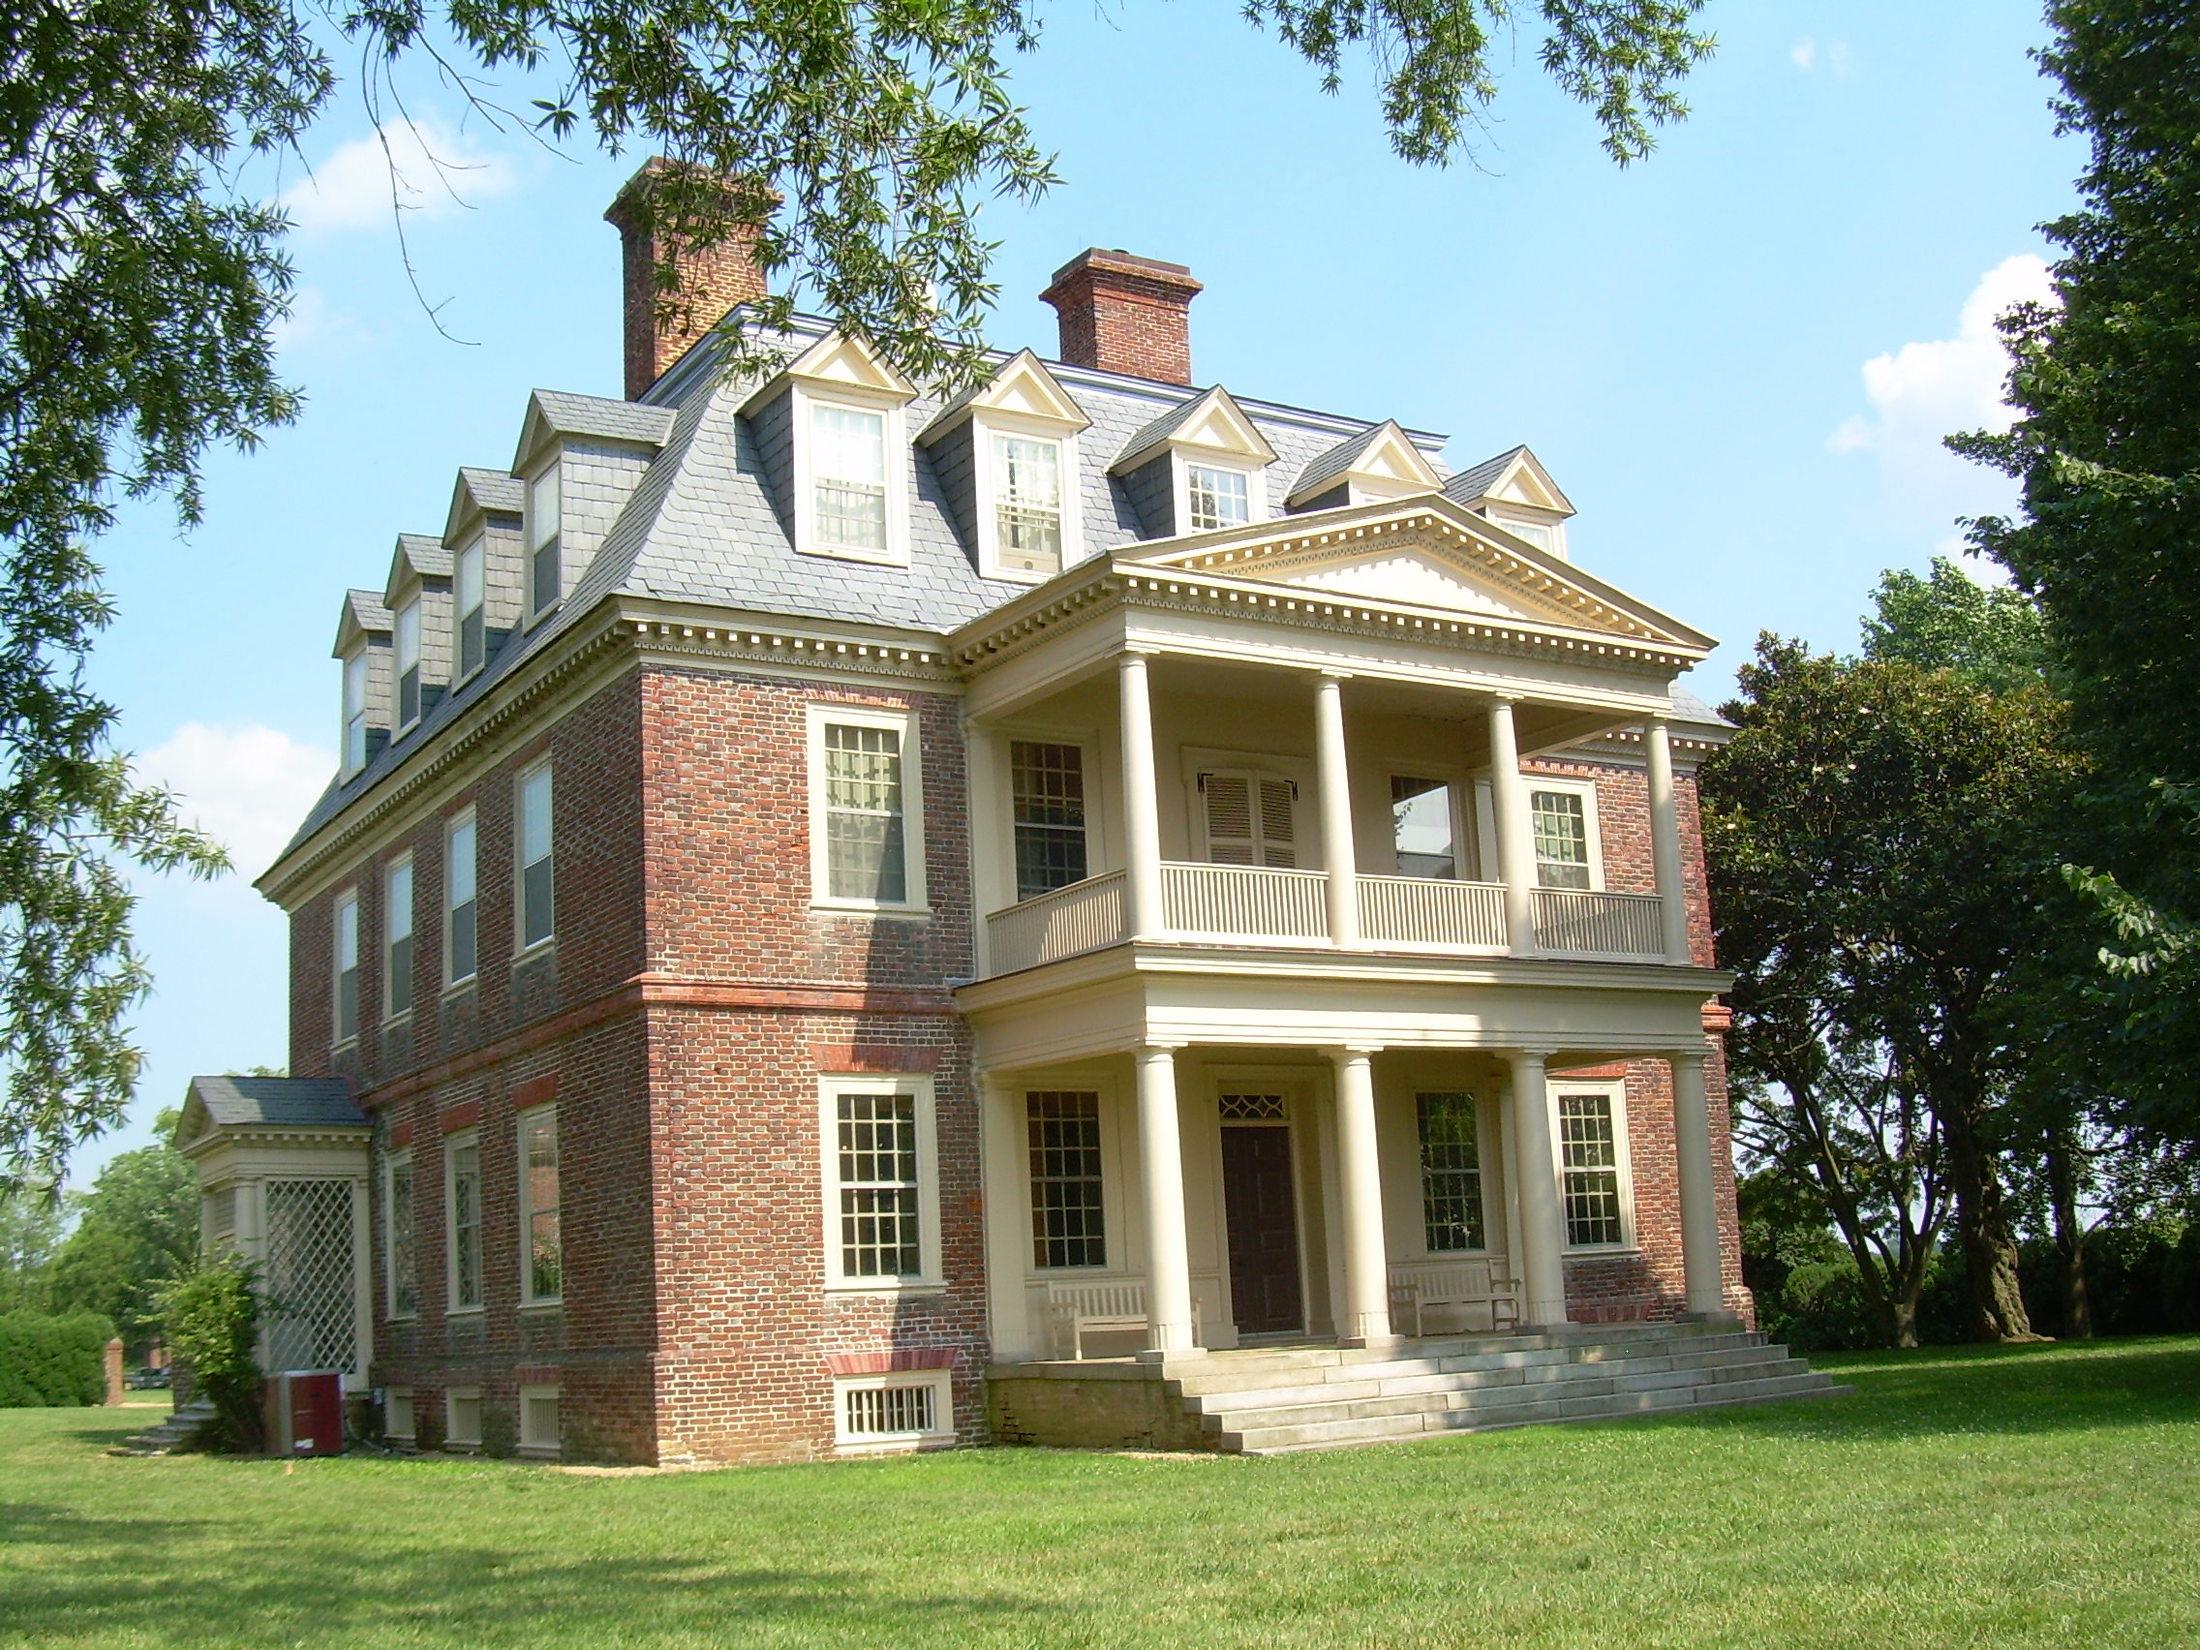 Ellicott City Real Estate Mls Listings Homes Condos